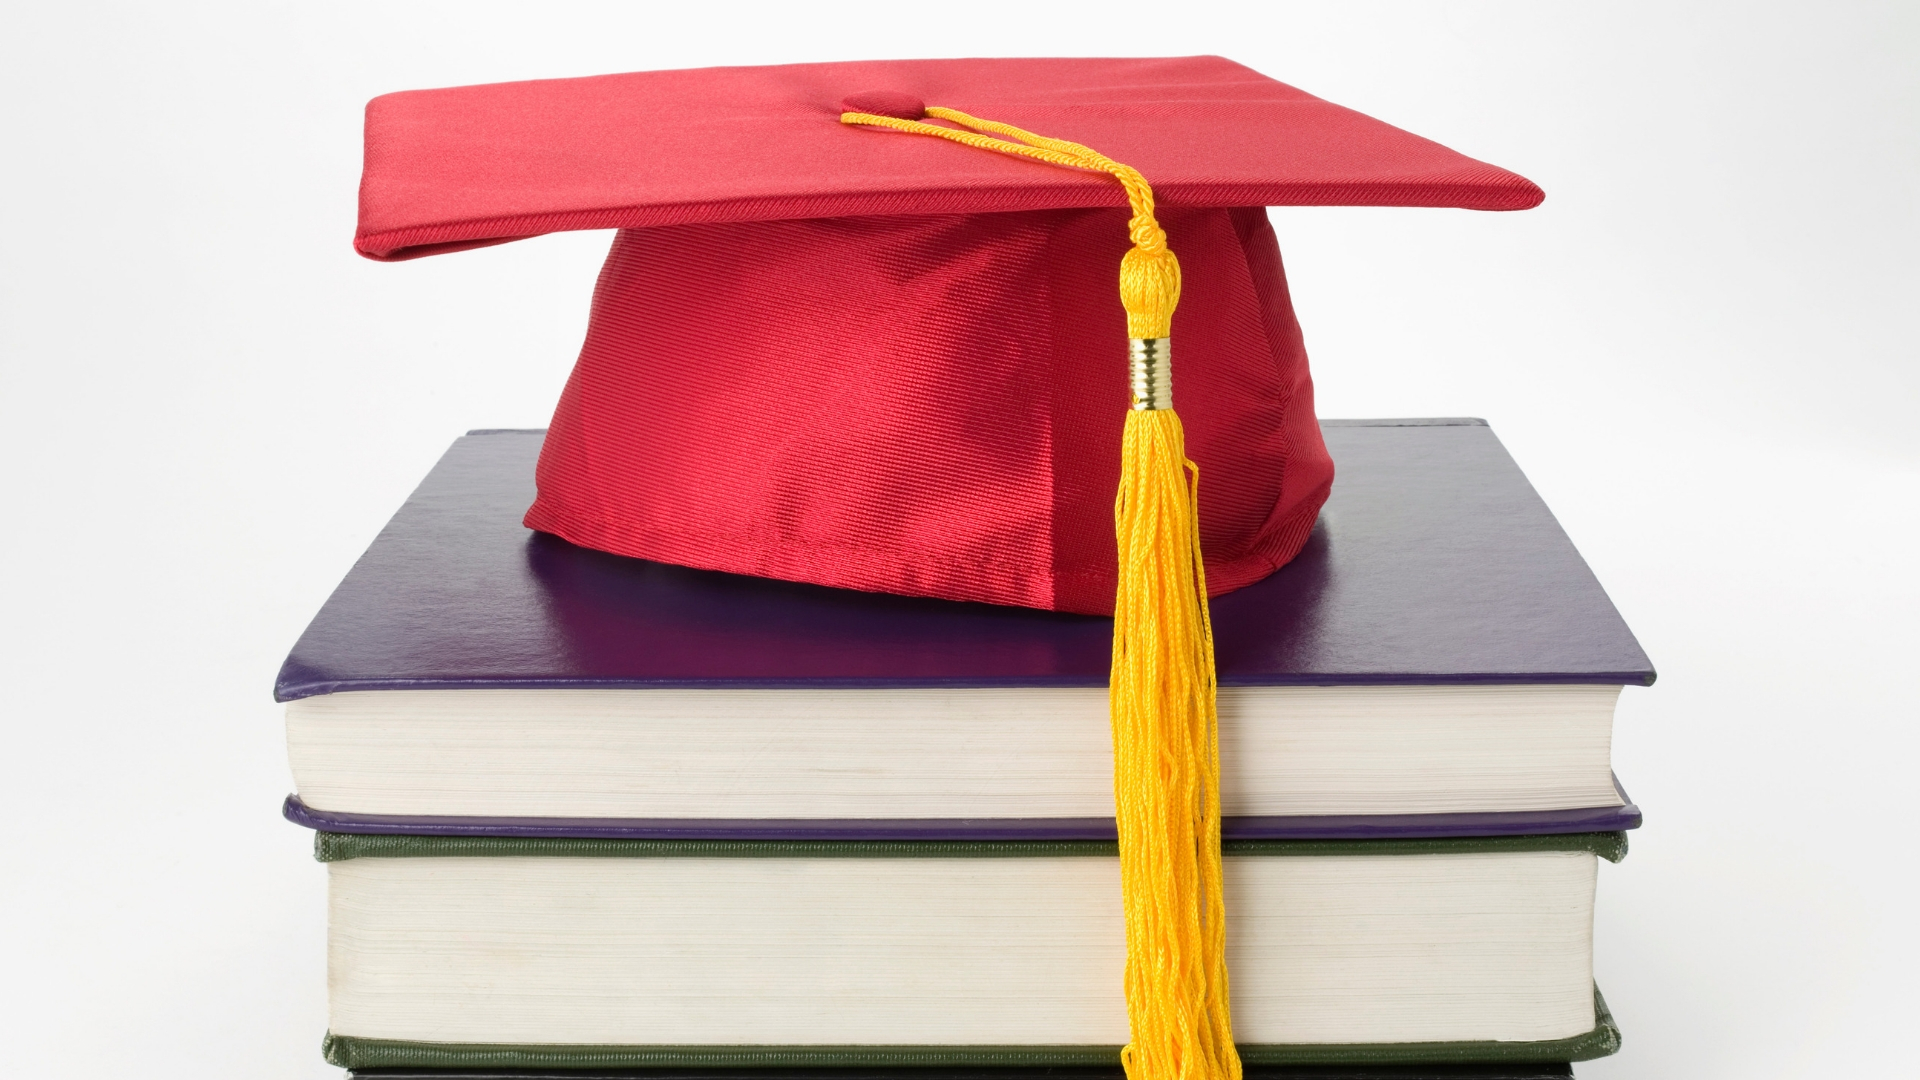 books and graduation cap